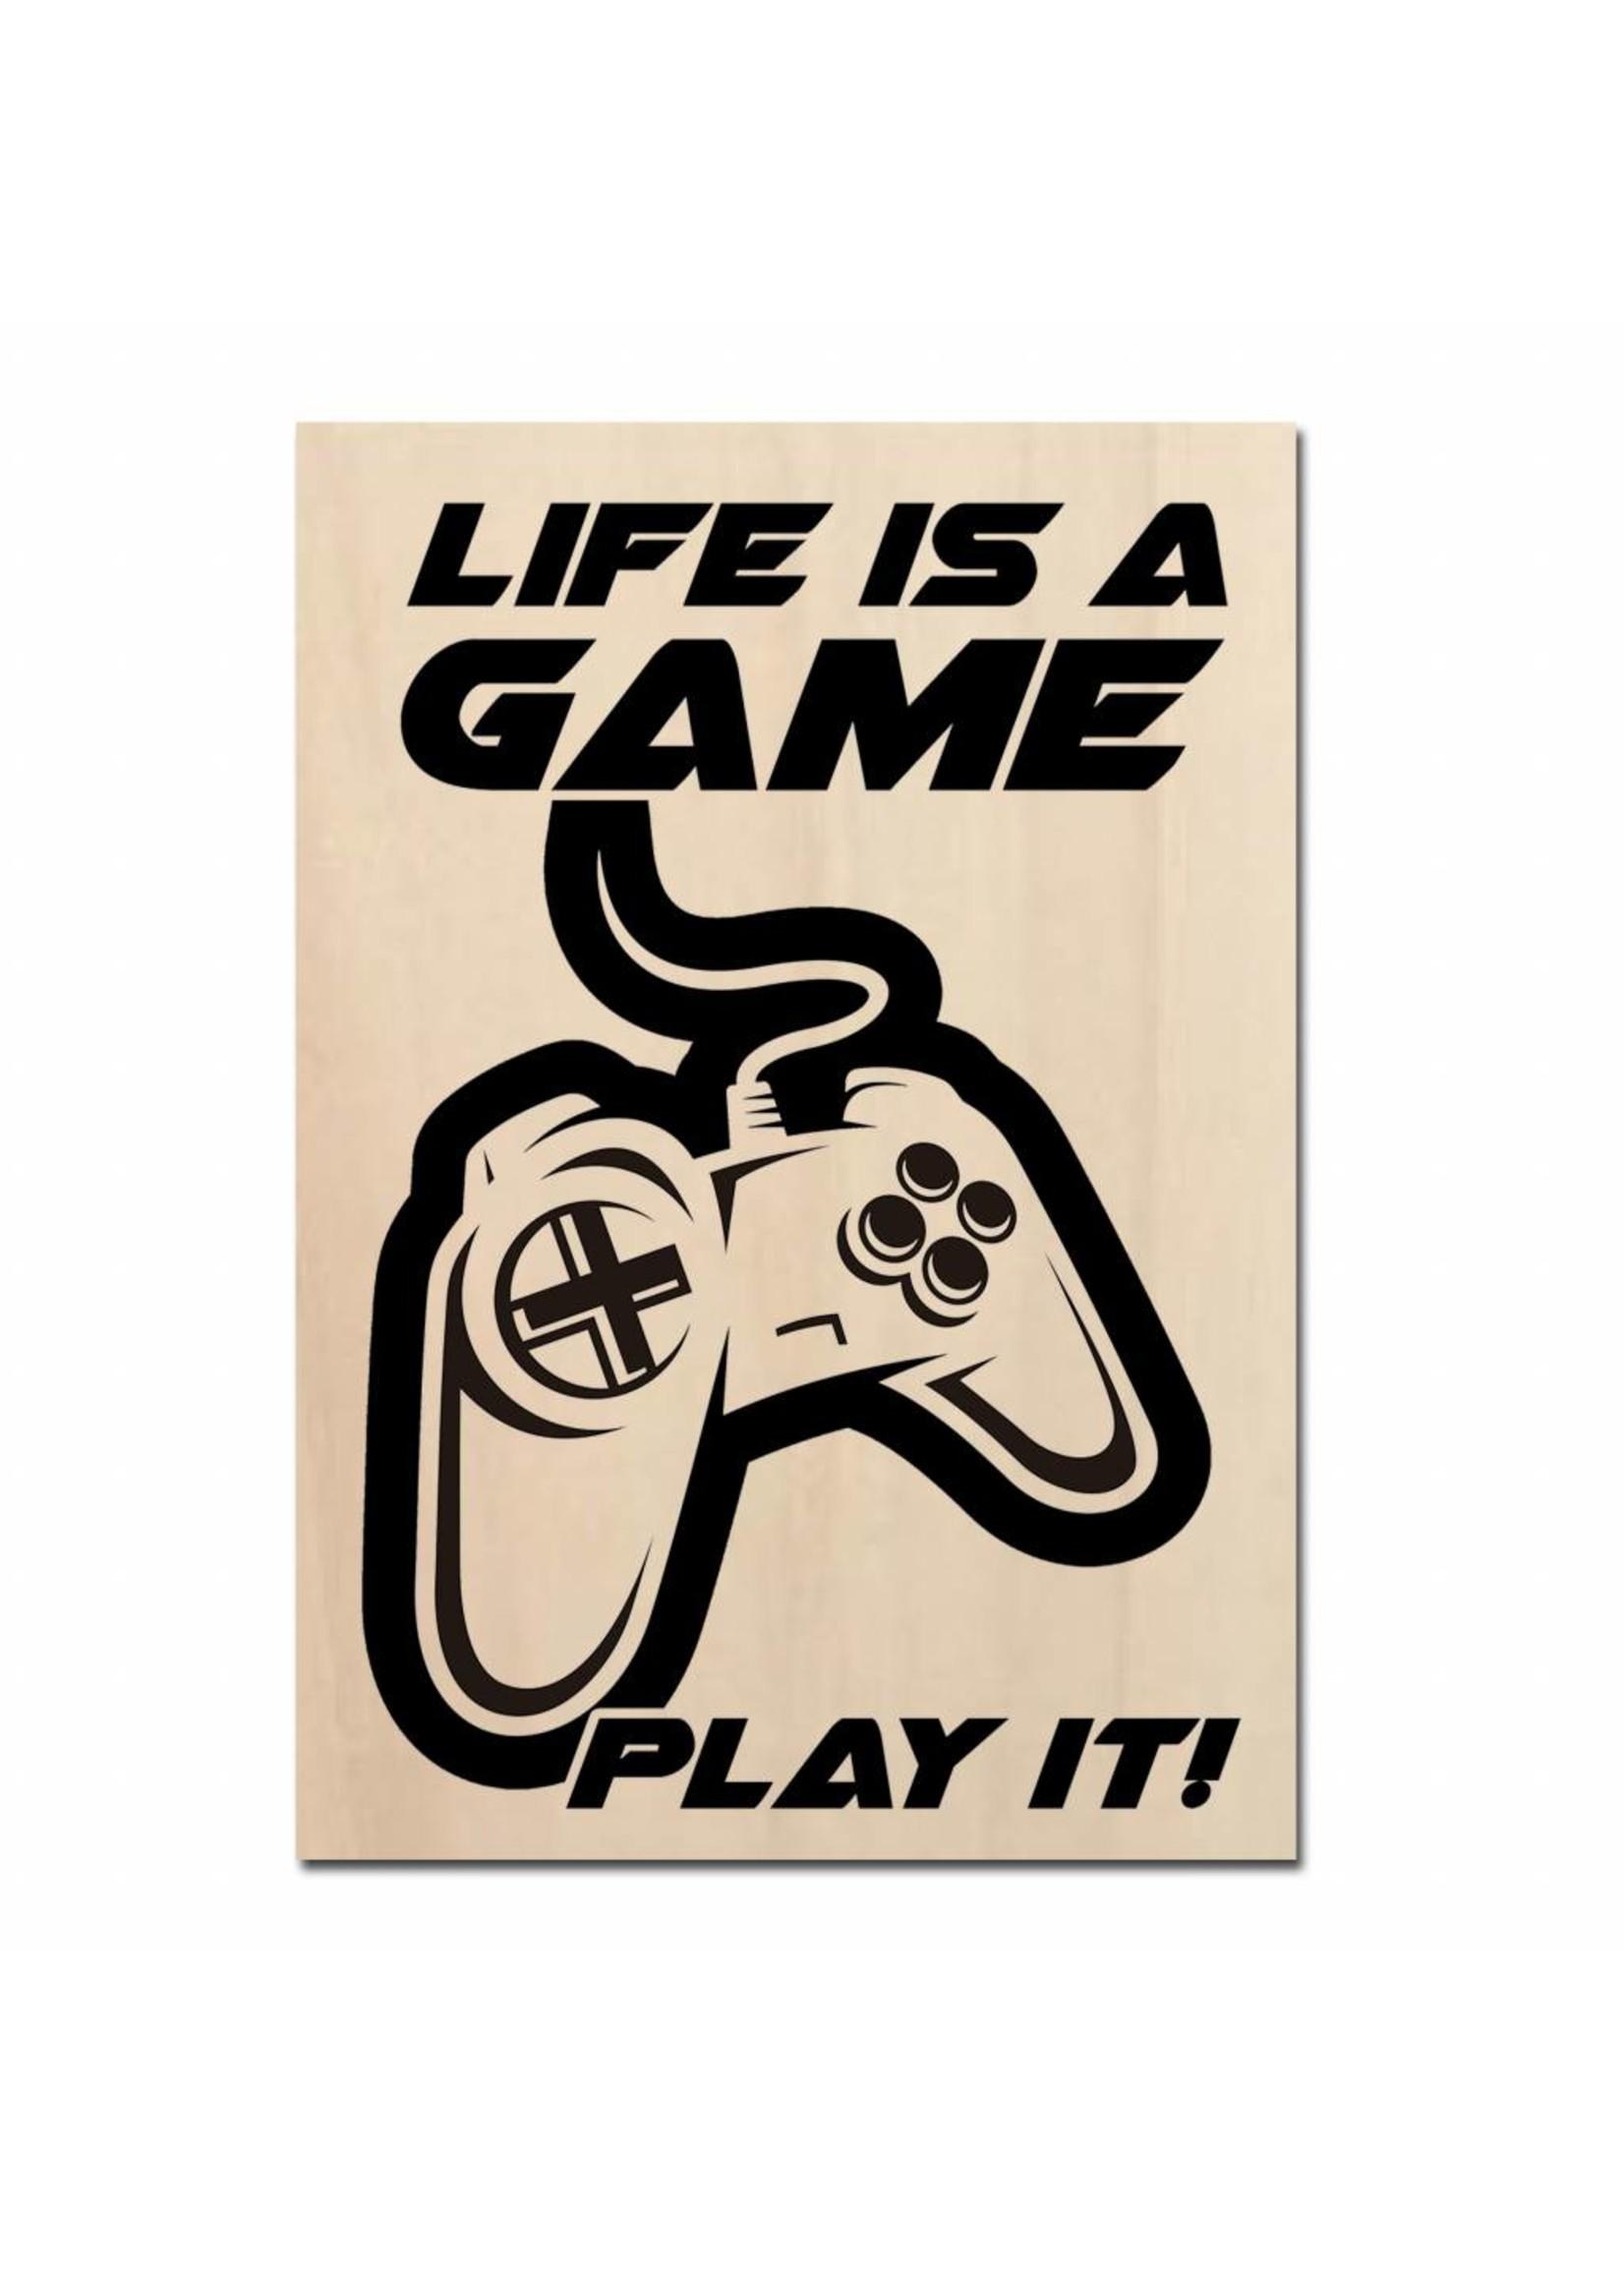 Life is a game play it gedrukt op hout